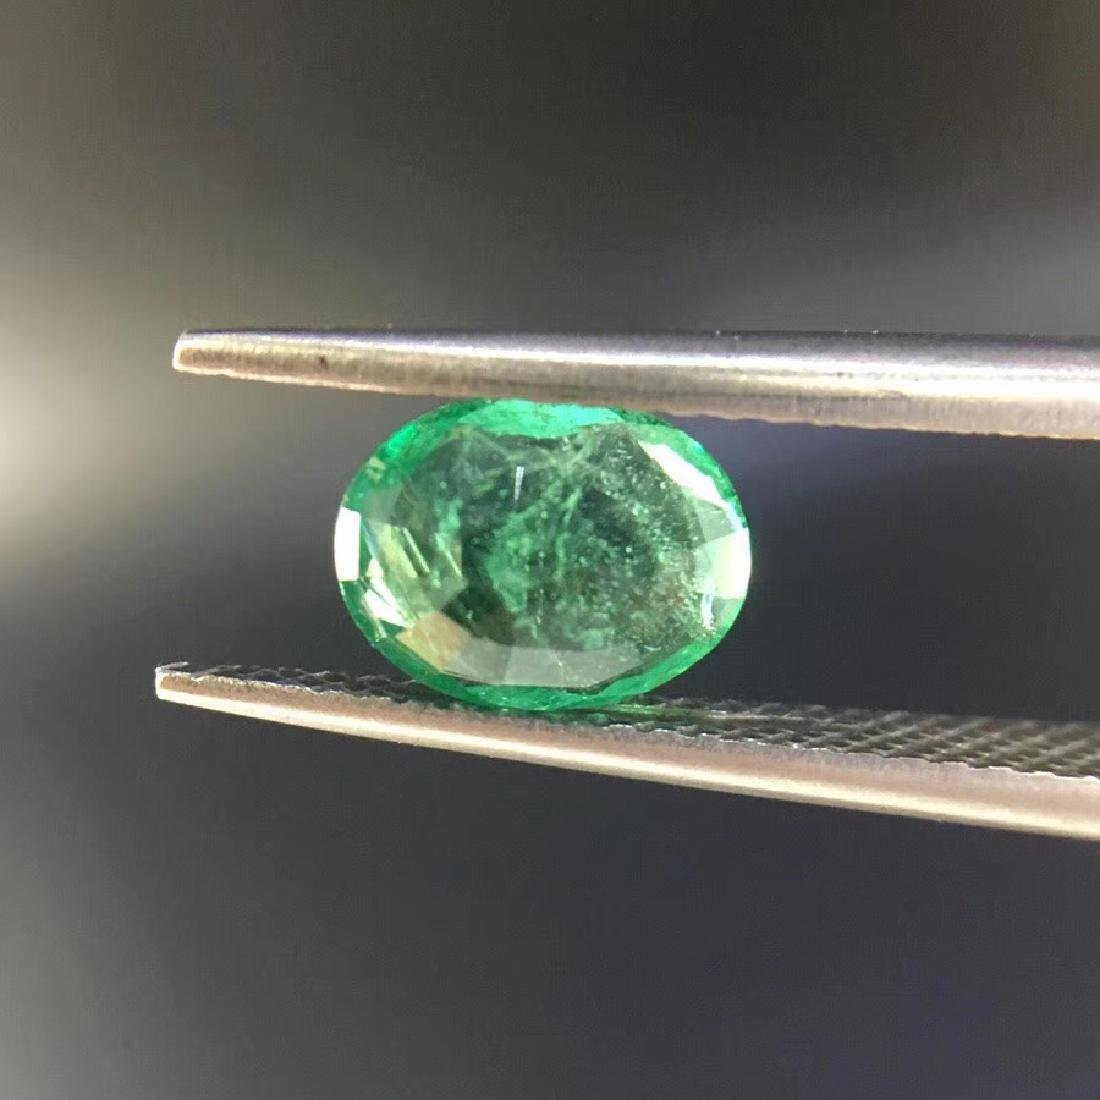 1.05 ct Emerald 6.0*7.8*3.2 mm Oval Cut - 4